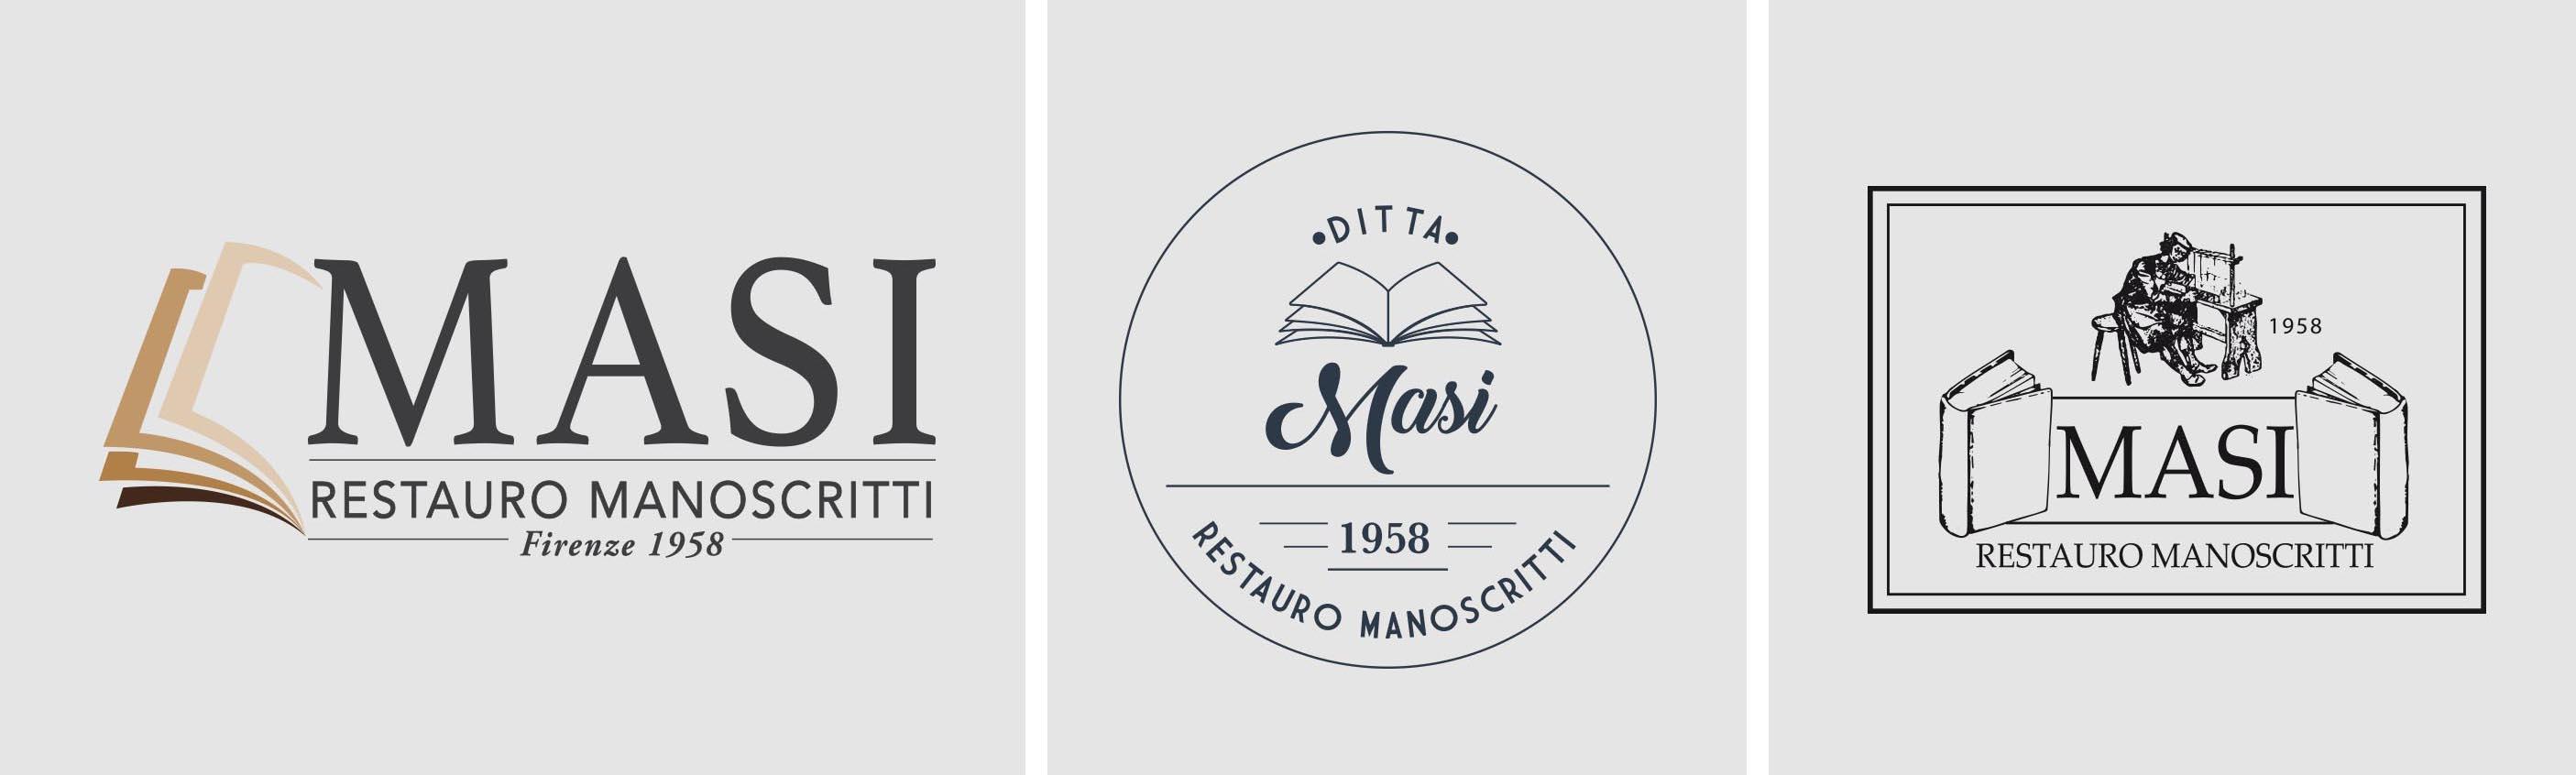 mockup-logomasirestauro-proposte-copia